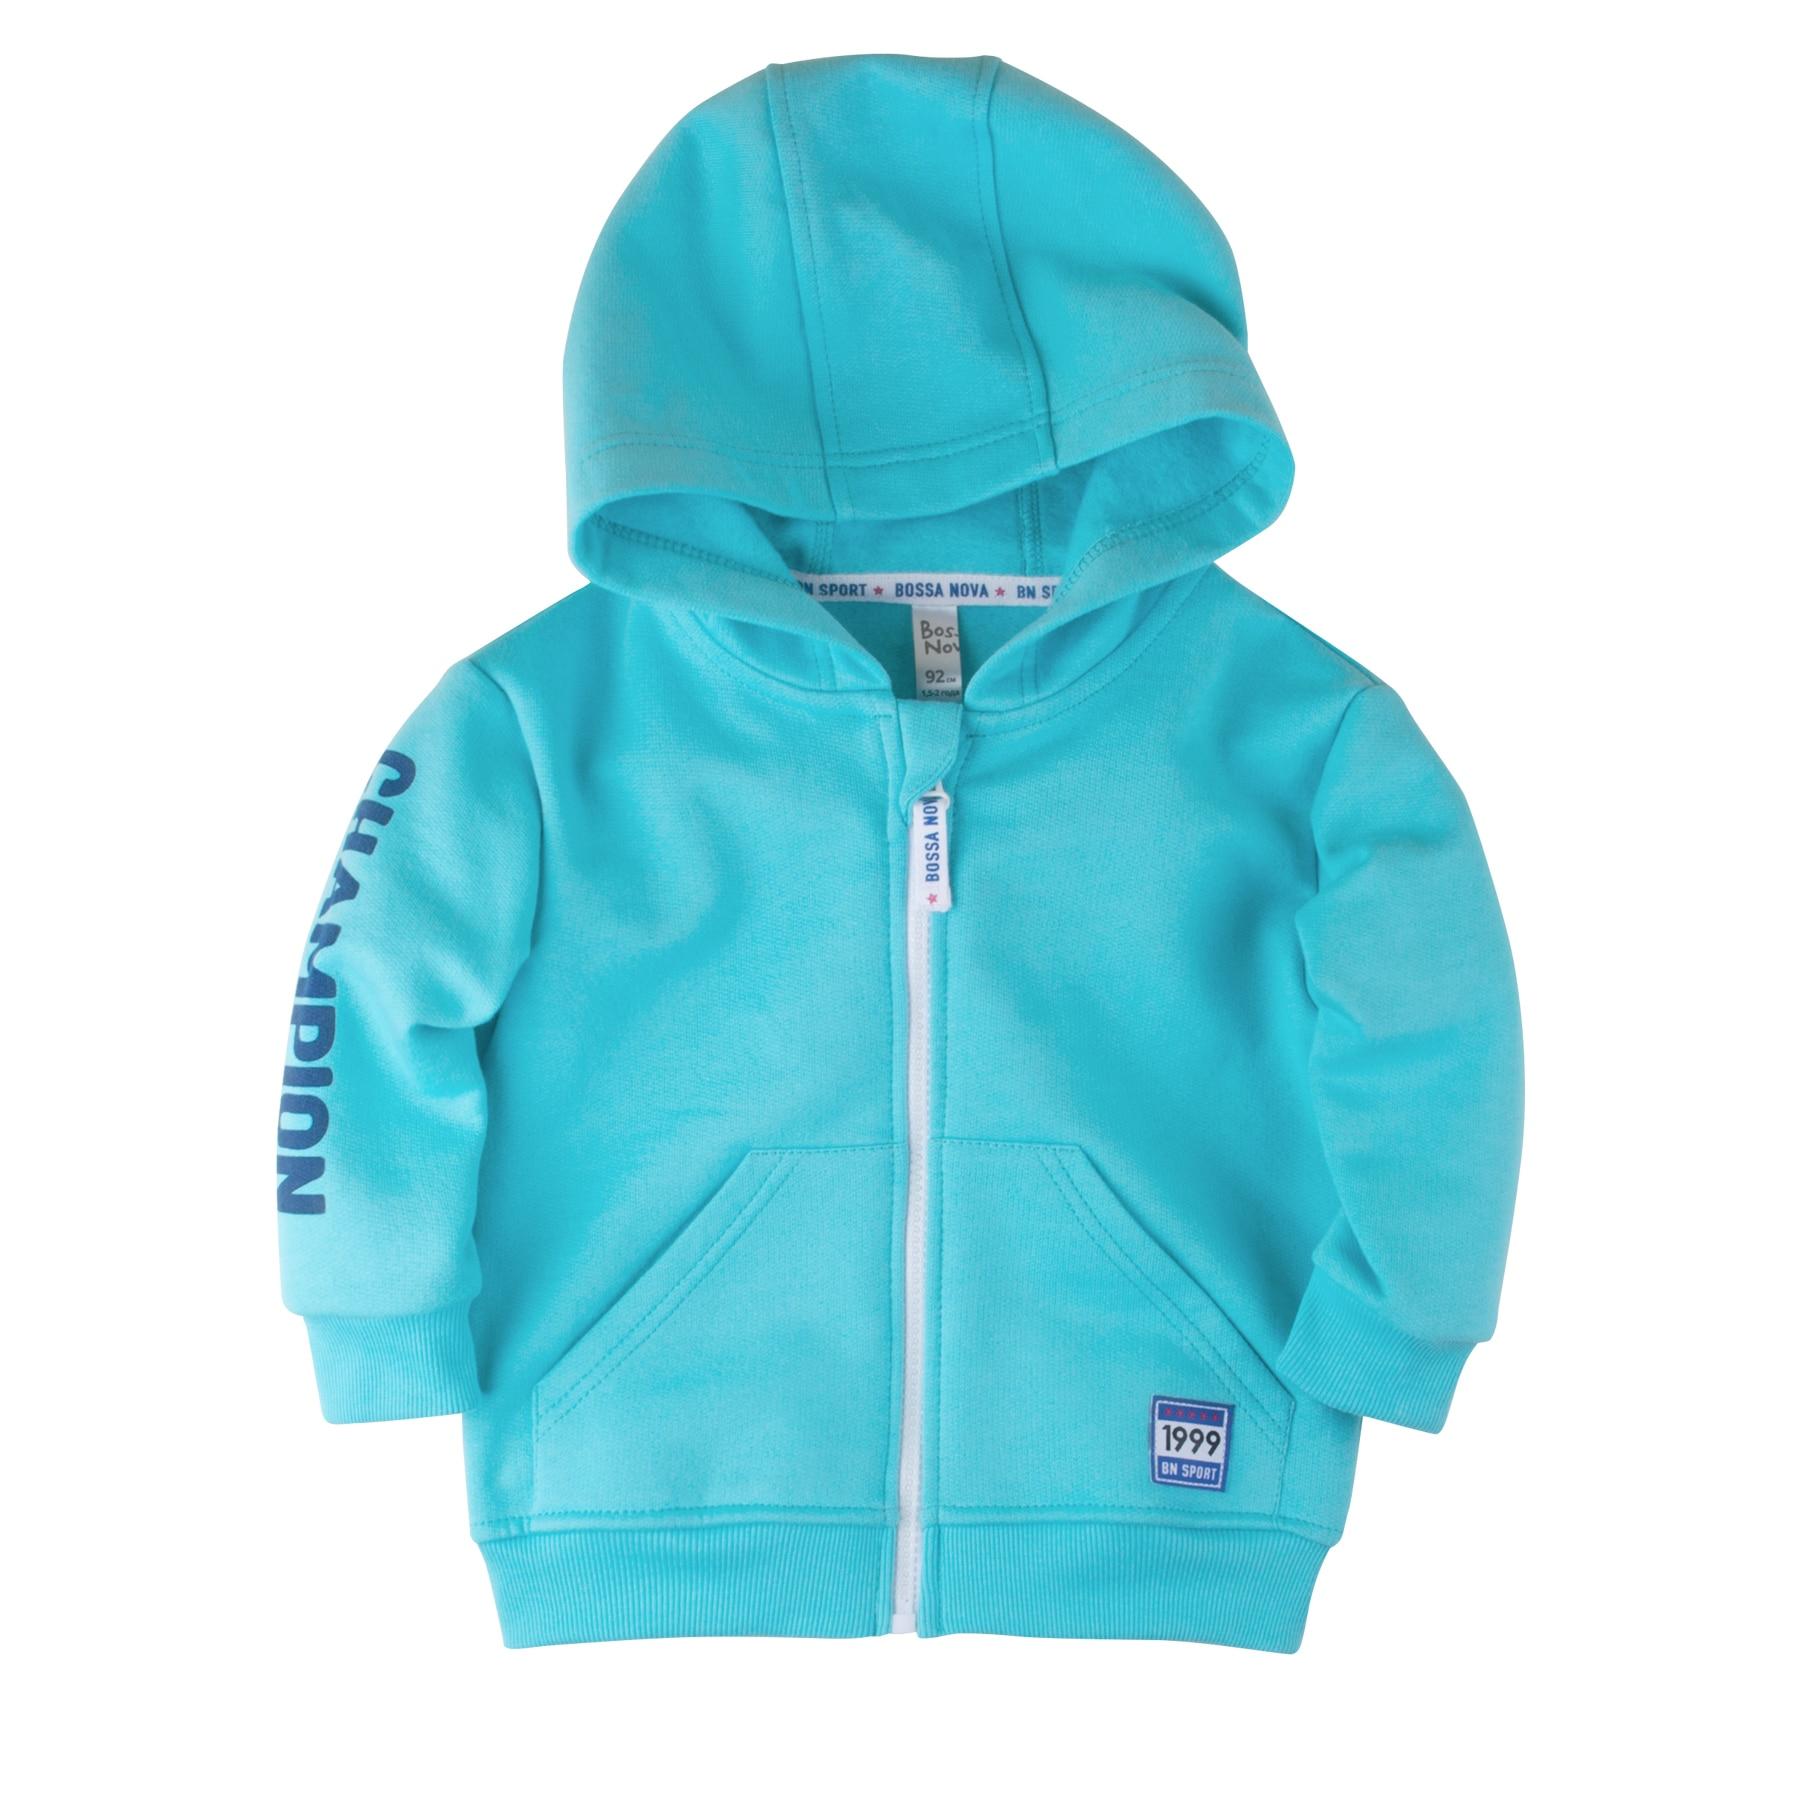 Sweatshirt for girls BOSSA NOVA 194B-462b kid clothes pants for girls bossa nova 487b 462b kid clothes